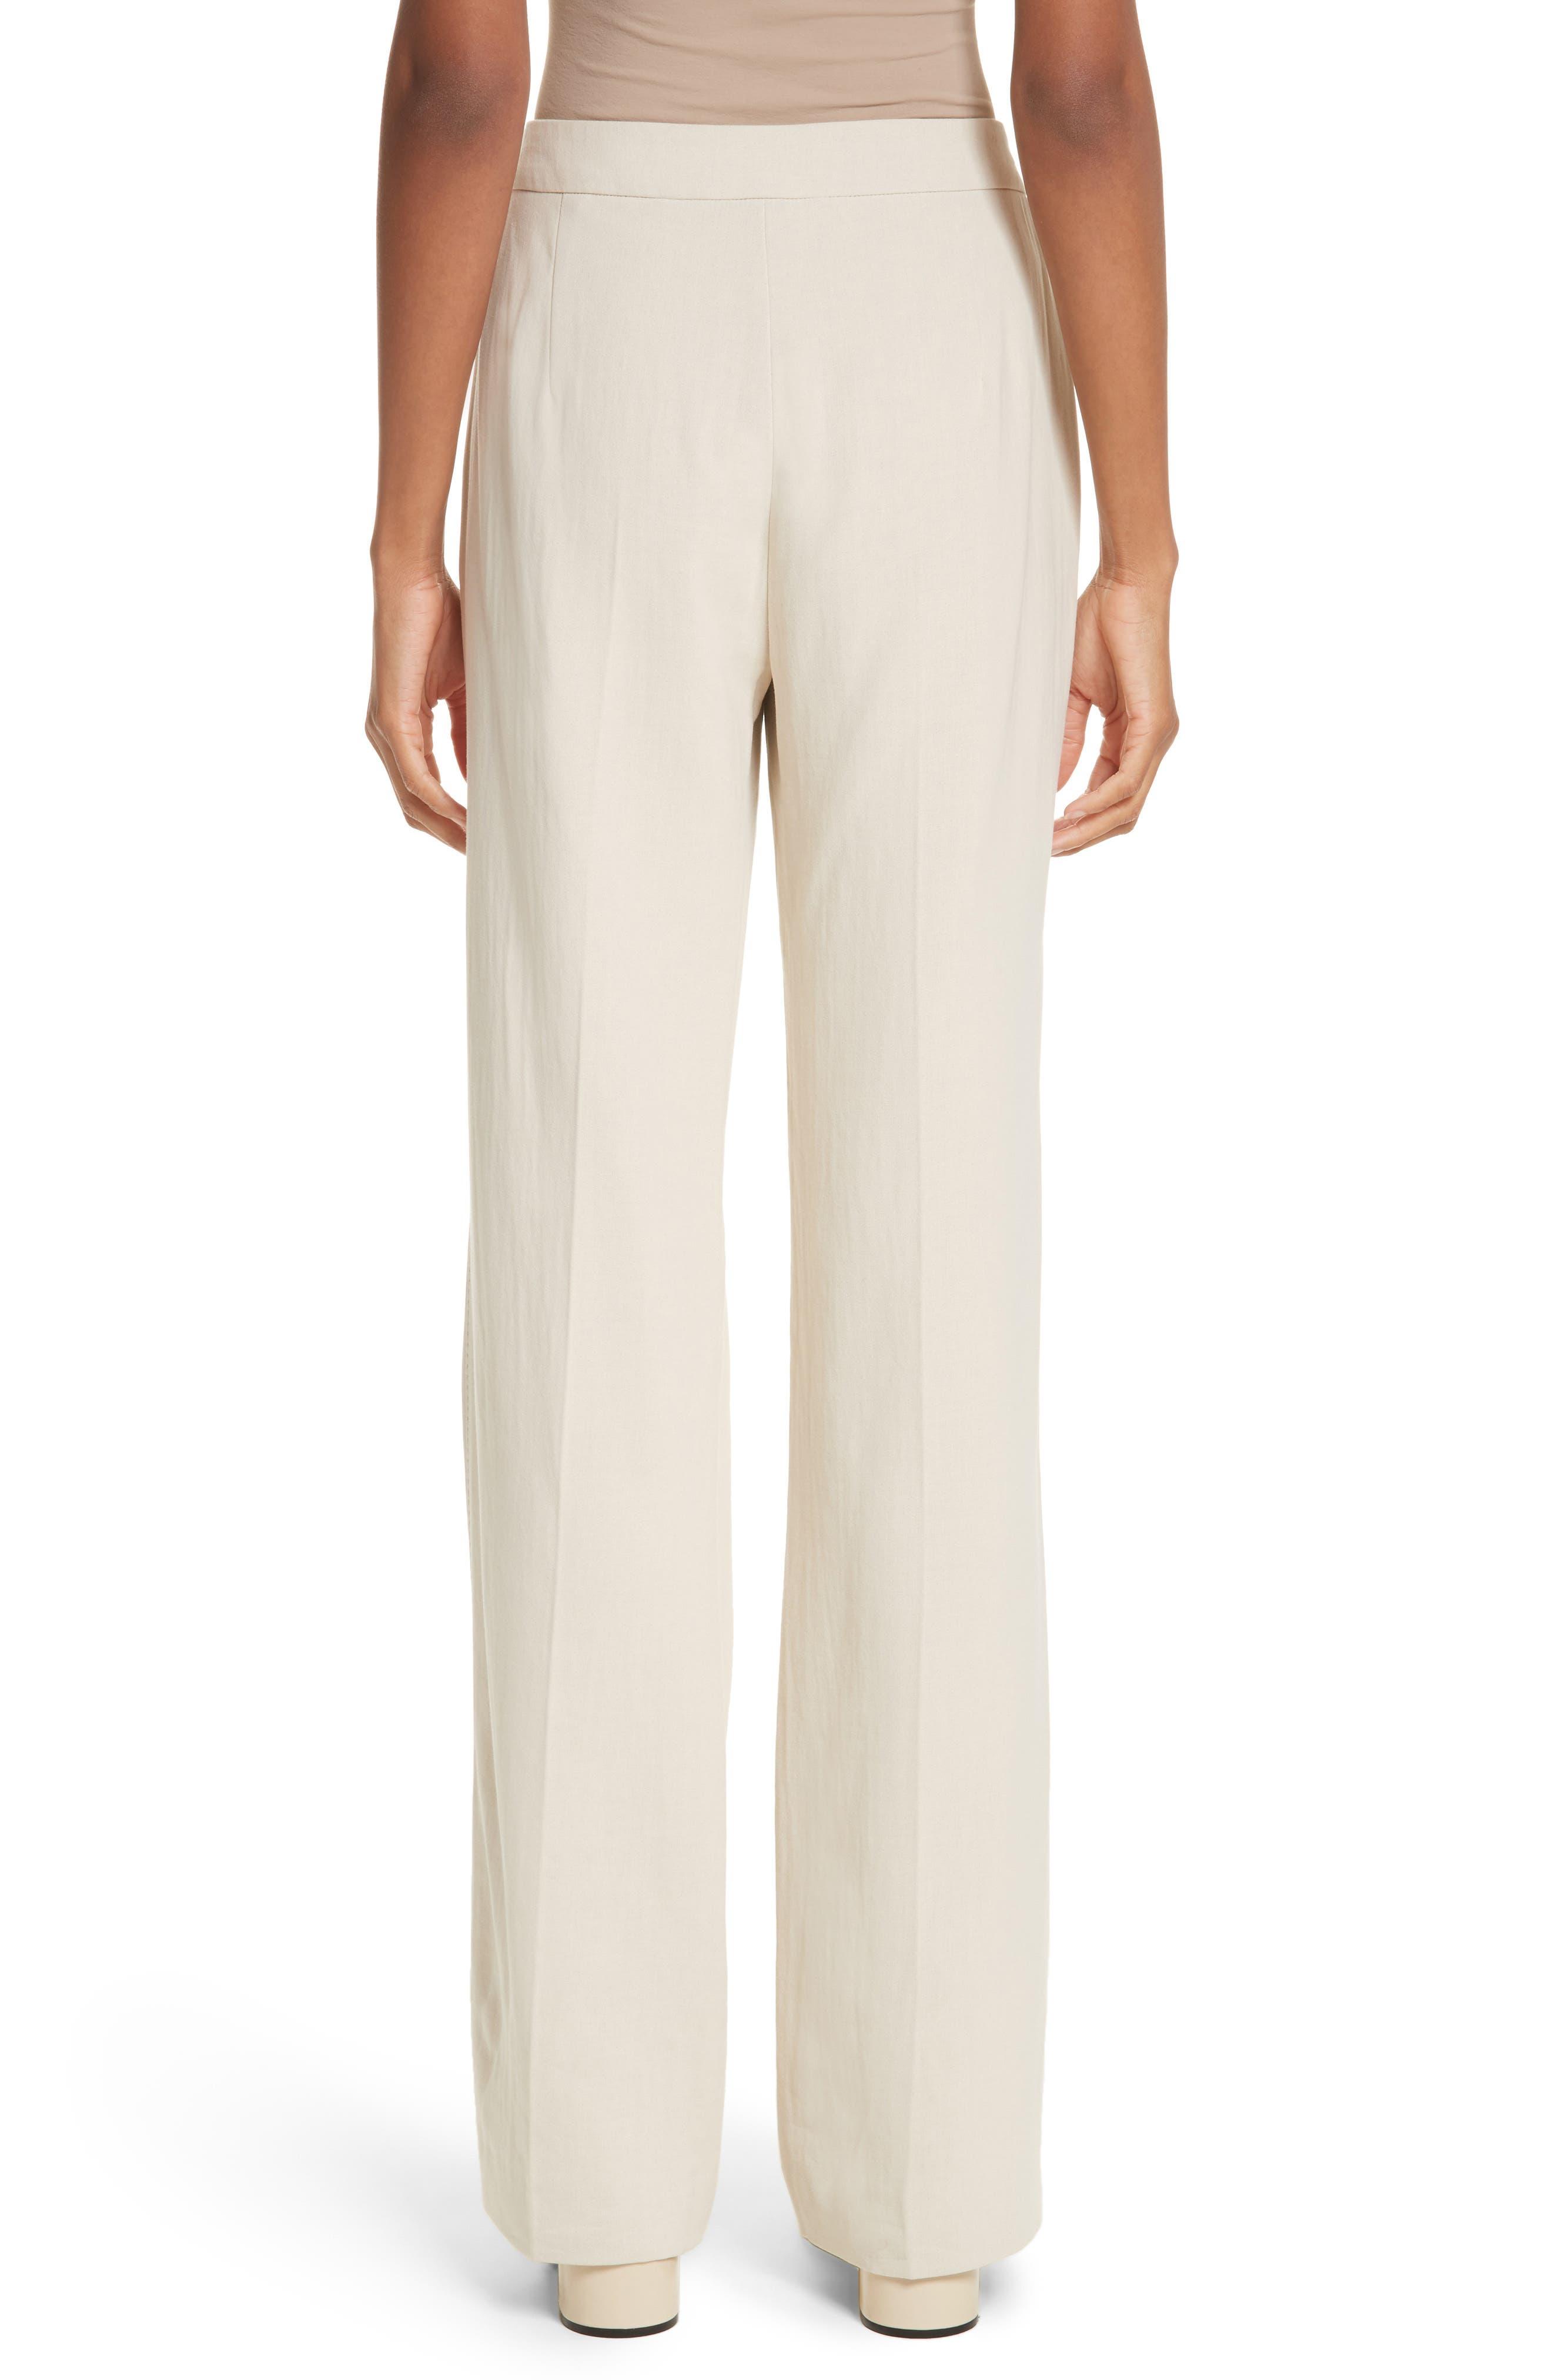 MAX MARA, Cursore Cotton Wide Leg Pants, Alternate thumbnail 2, color, 900